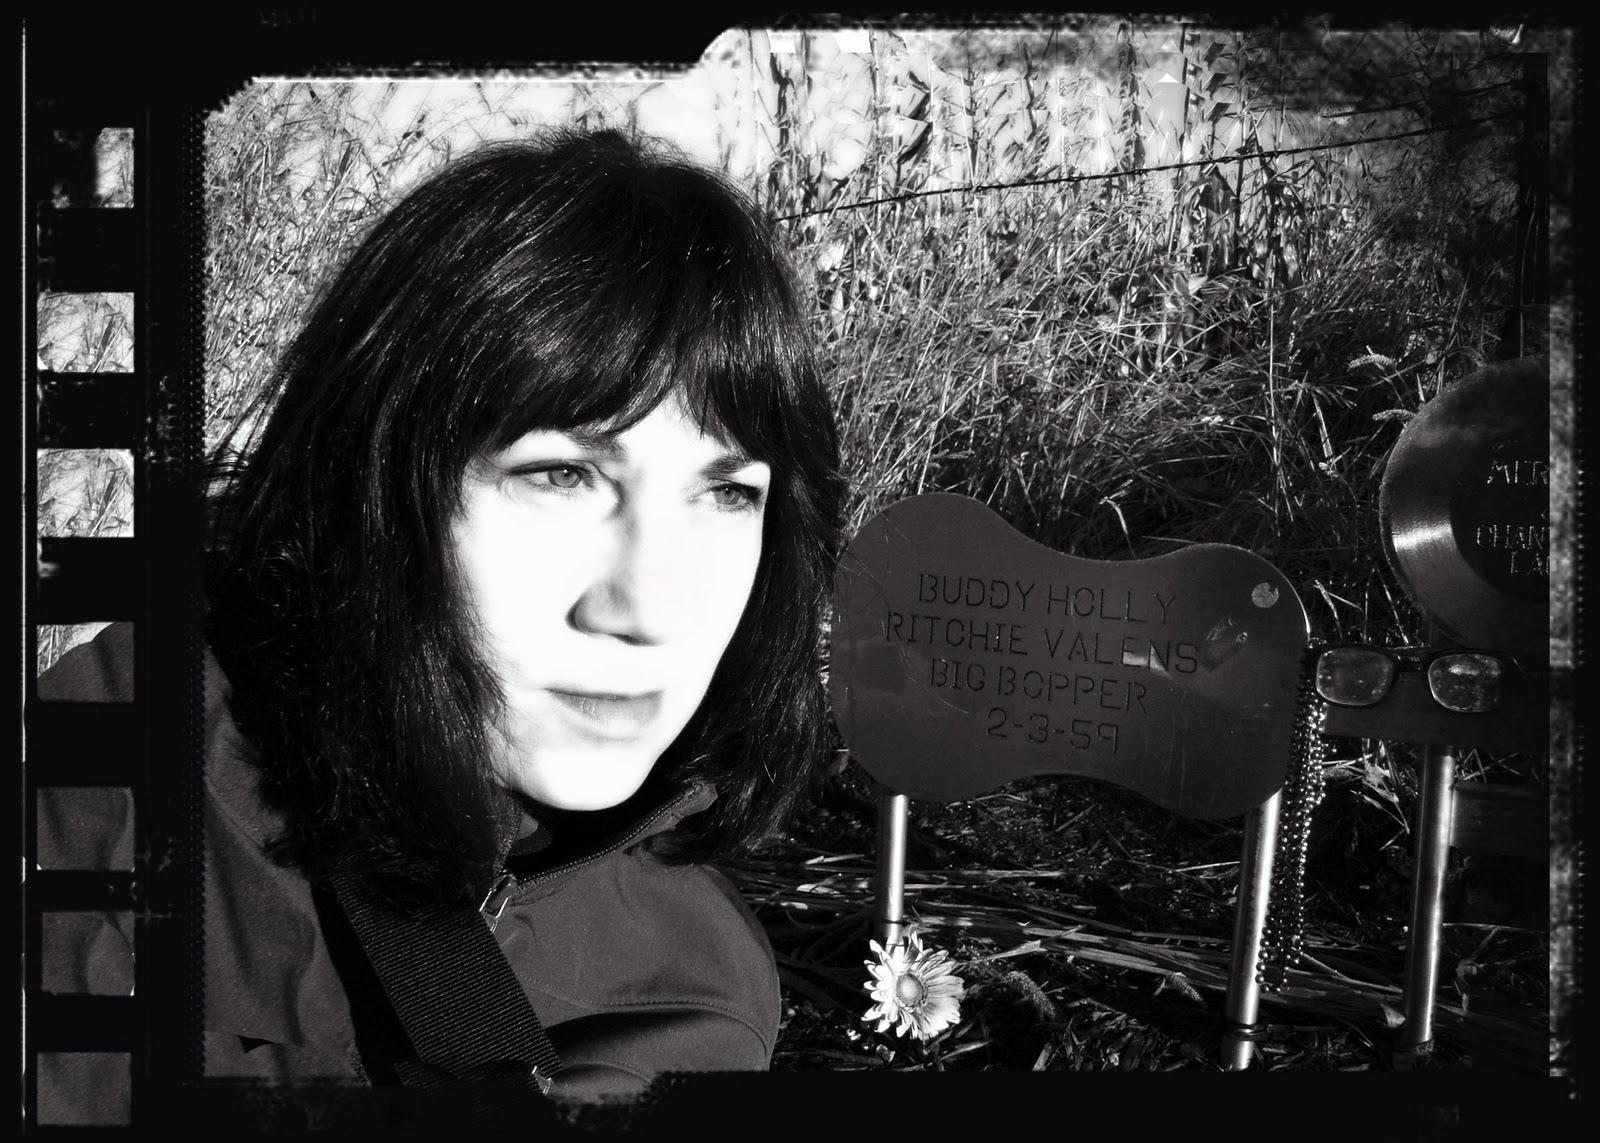 Ritchie Valens Casket Ritchie valens casket